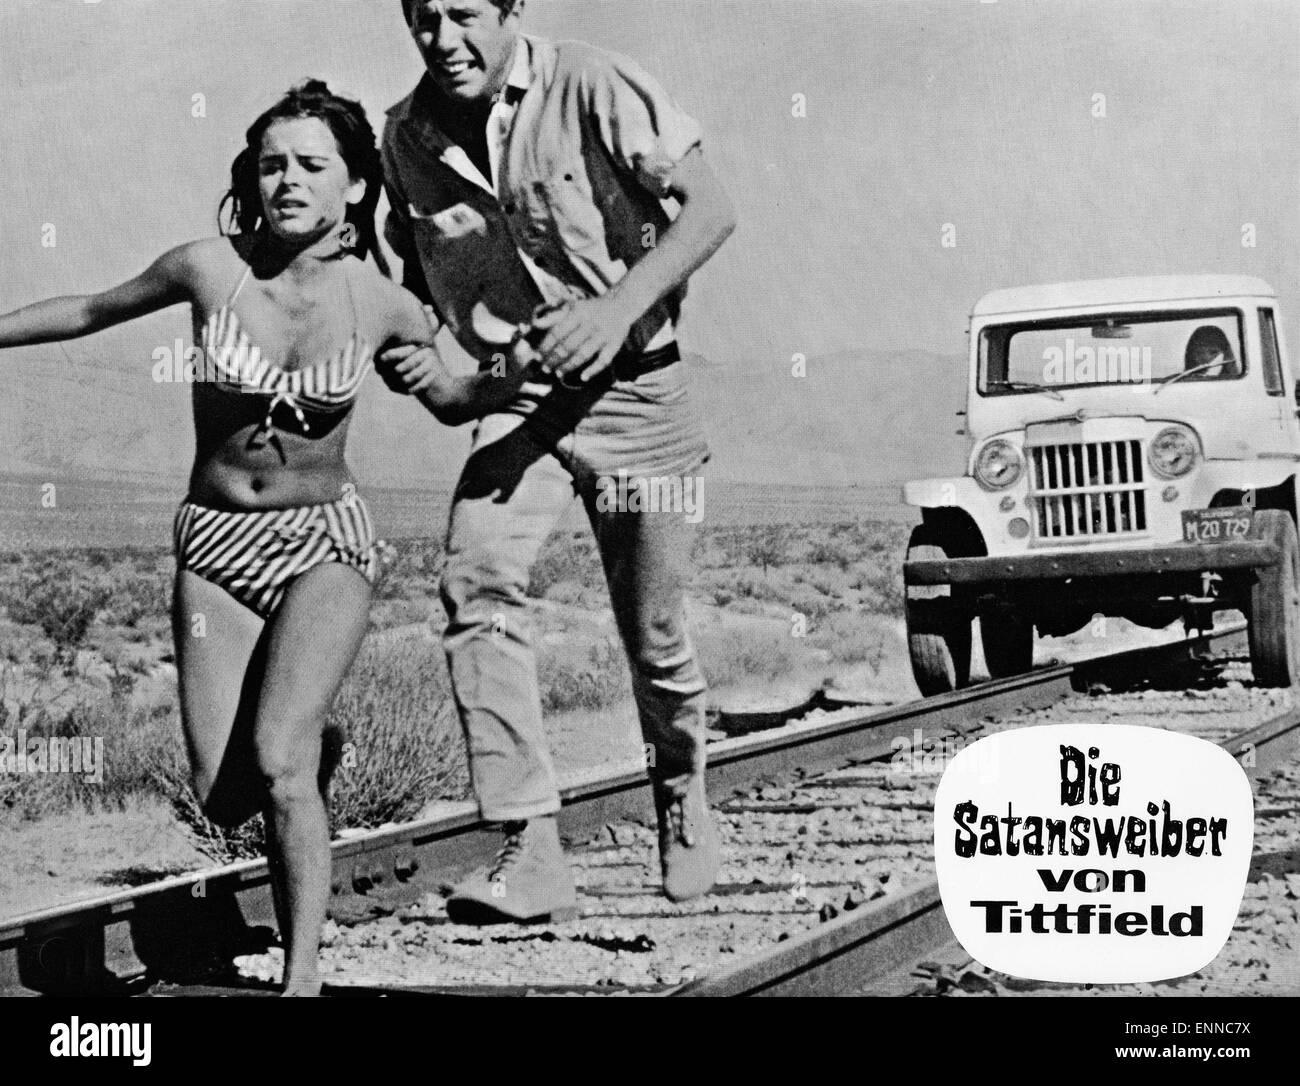 Faster, Pussycat! Kill! Kill!, USA 1965, aka: Die Satansweiber von Tittfield, Regie: Russ Meyer, Darsteller: Susan - Stock Image